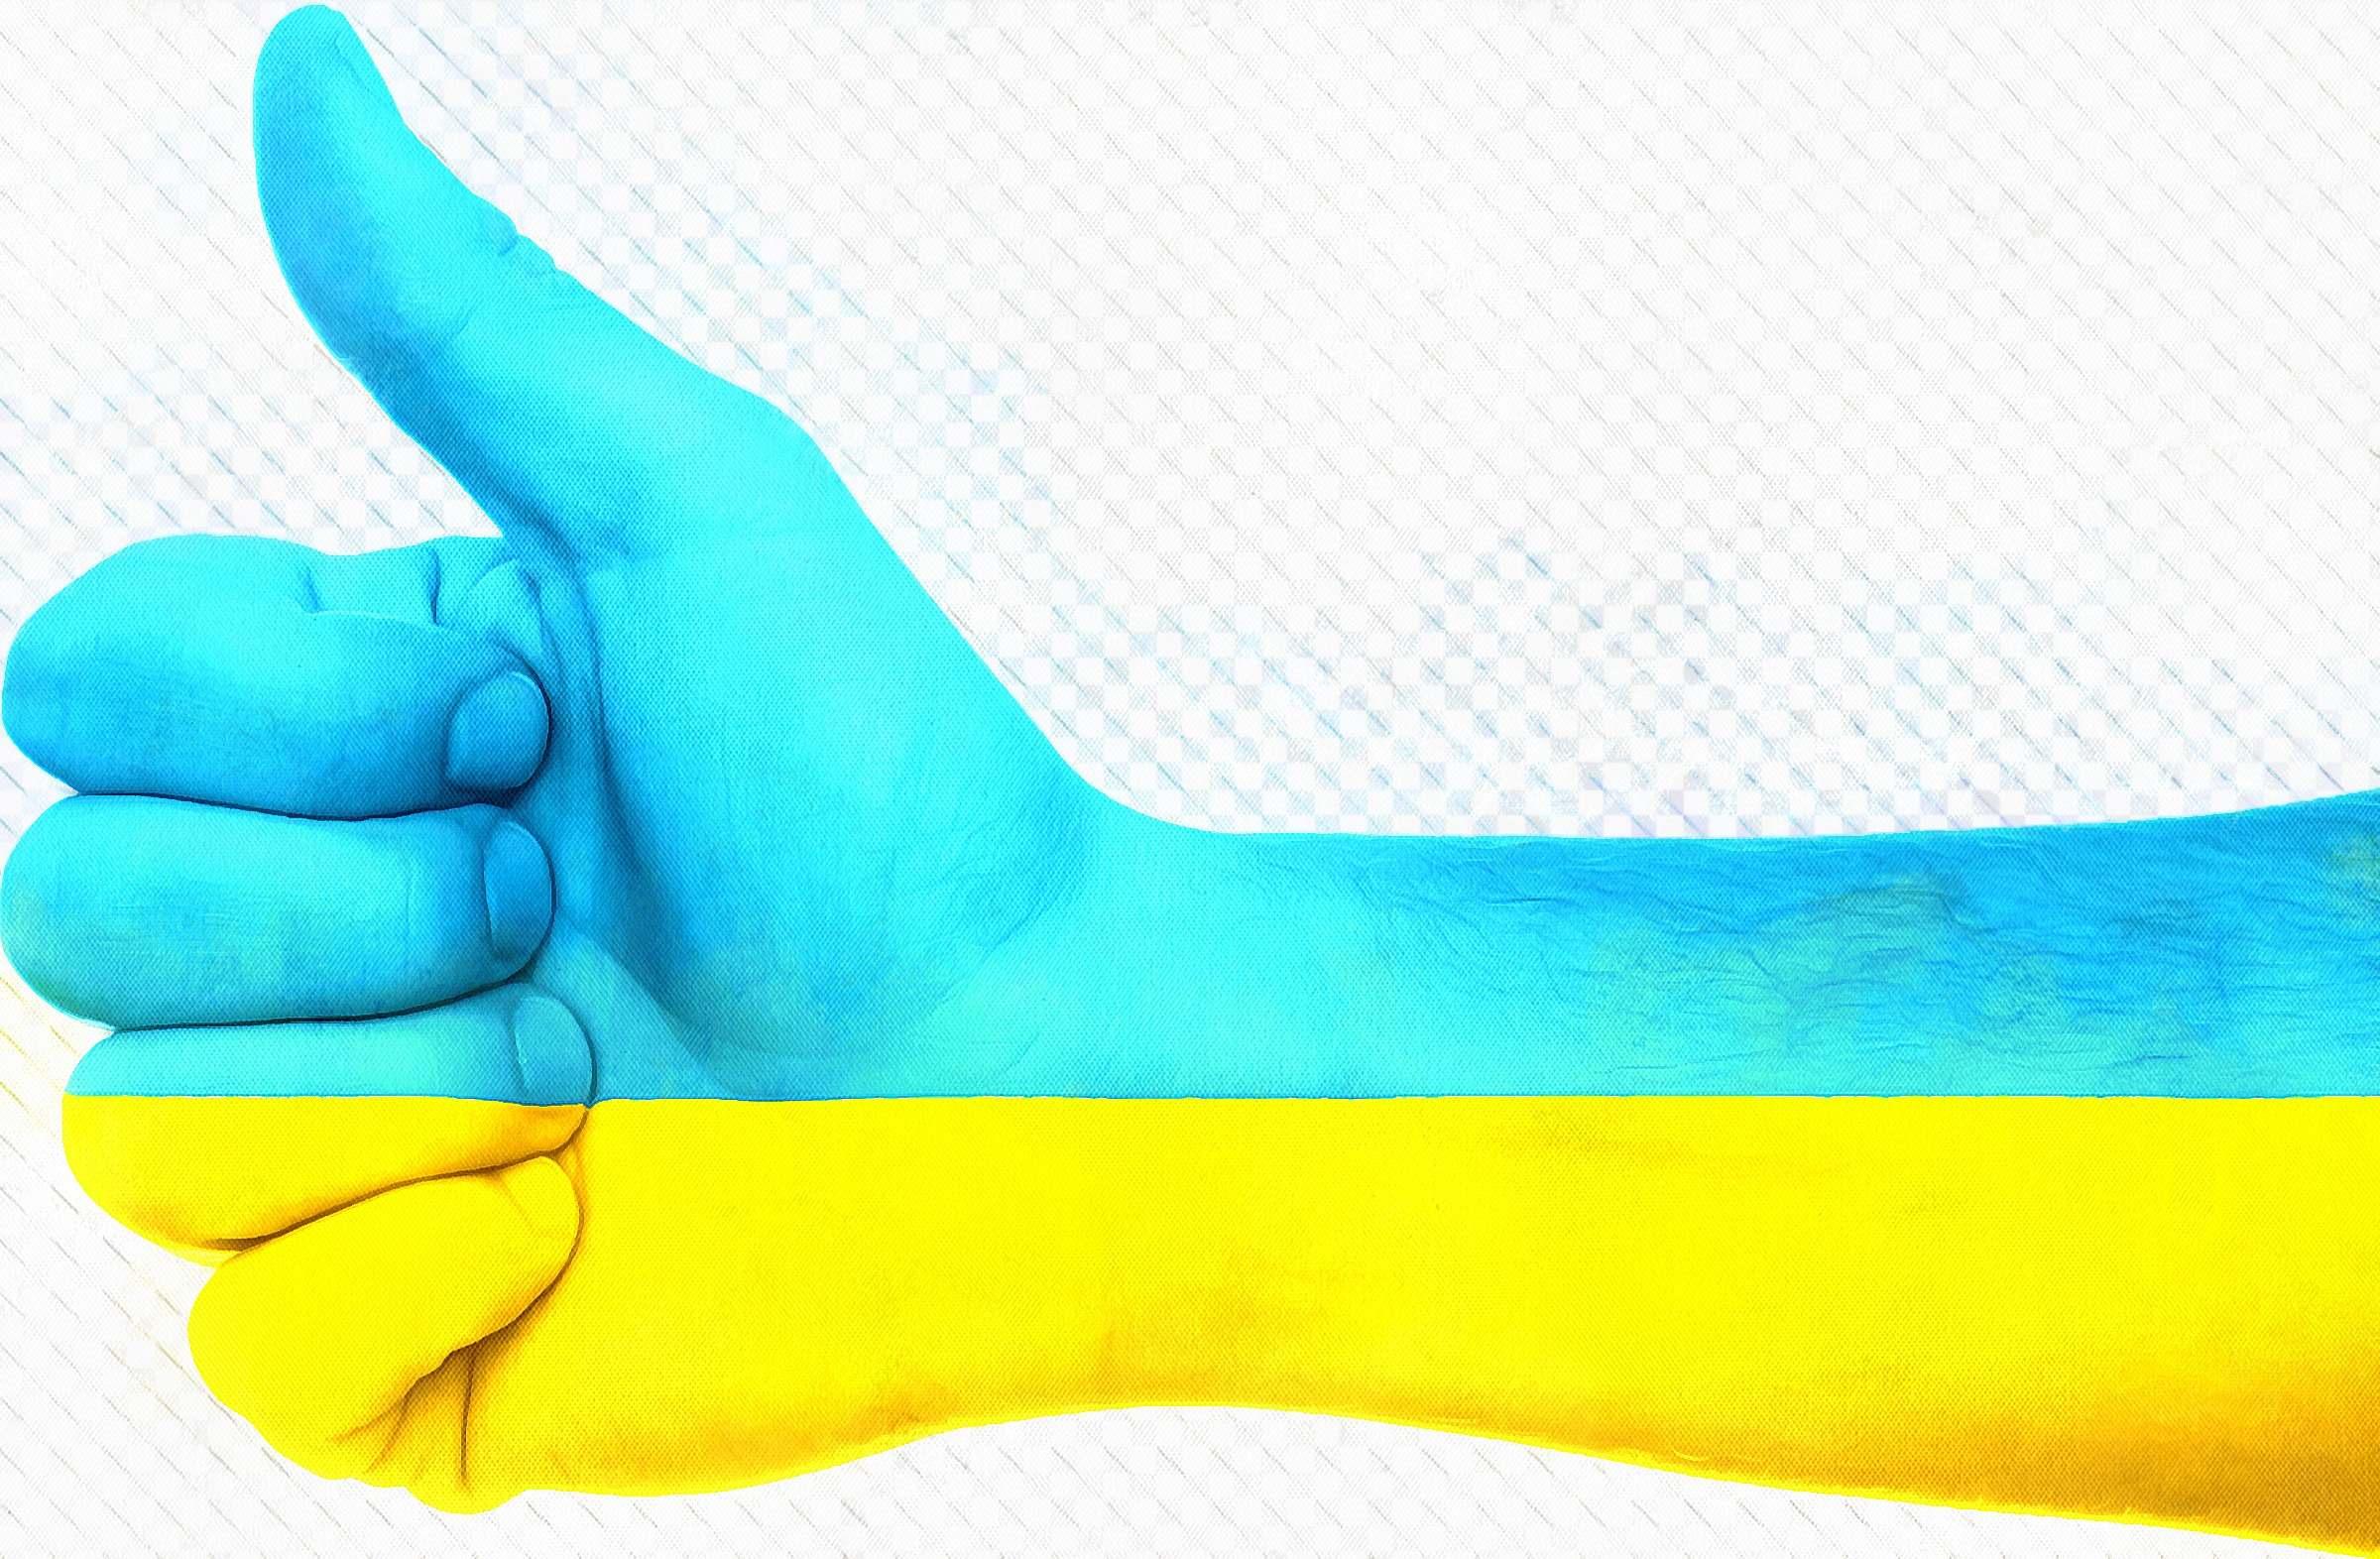 Ukraine Facts - Interesting Facts about Ukraine